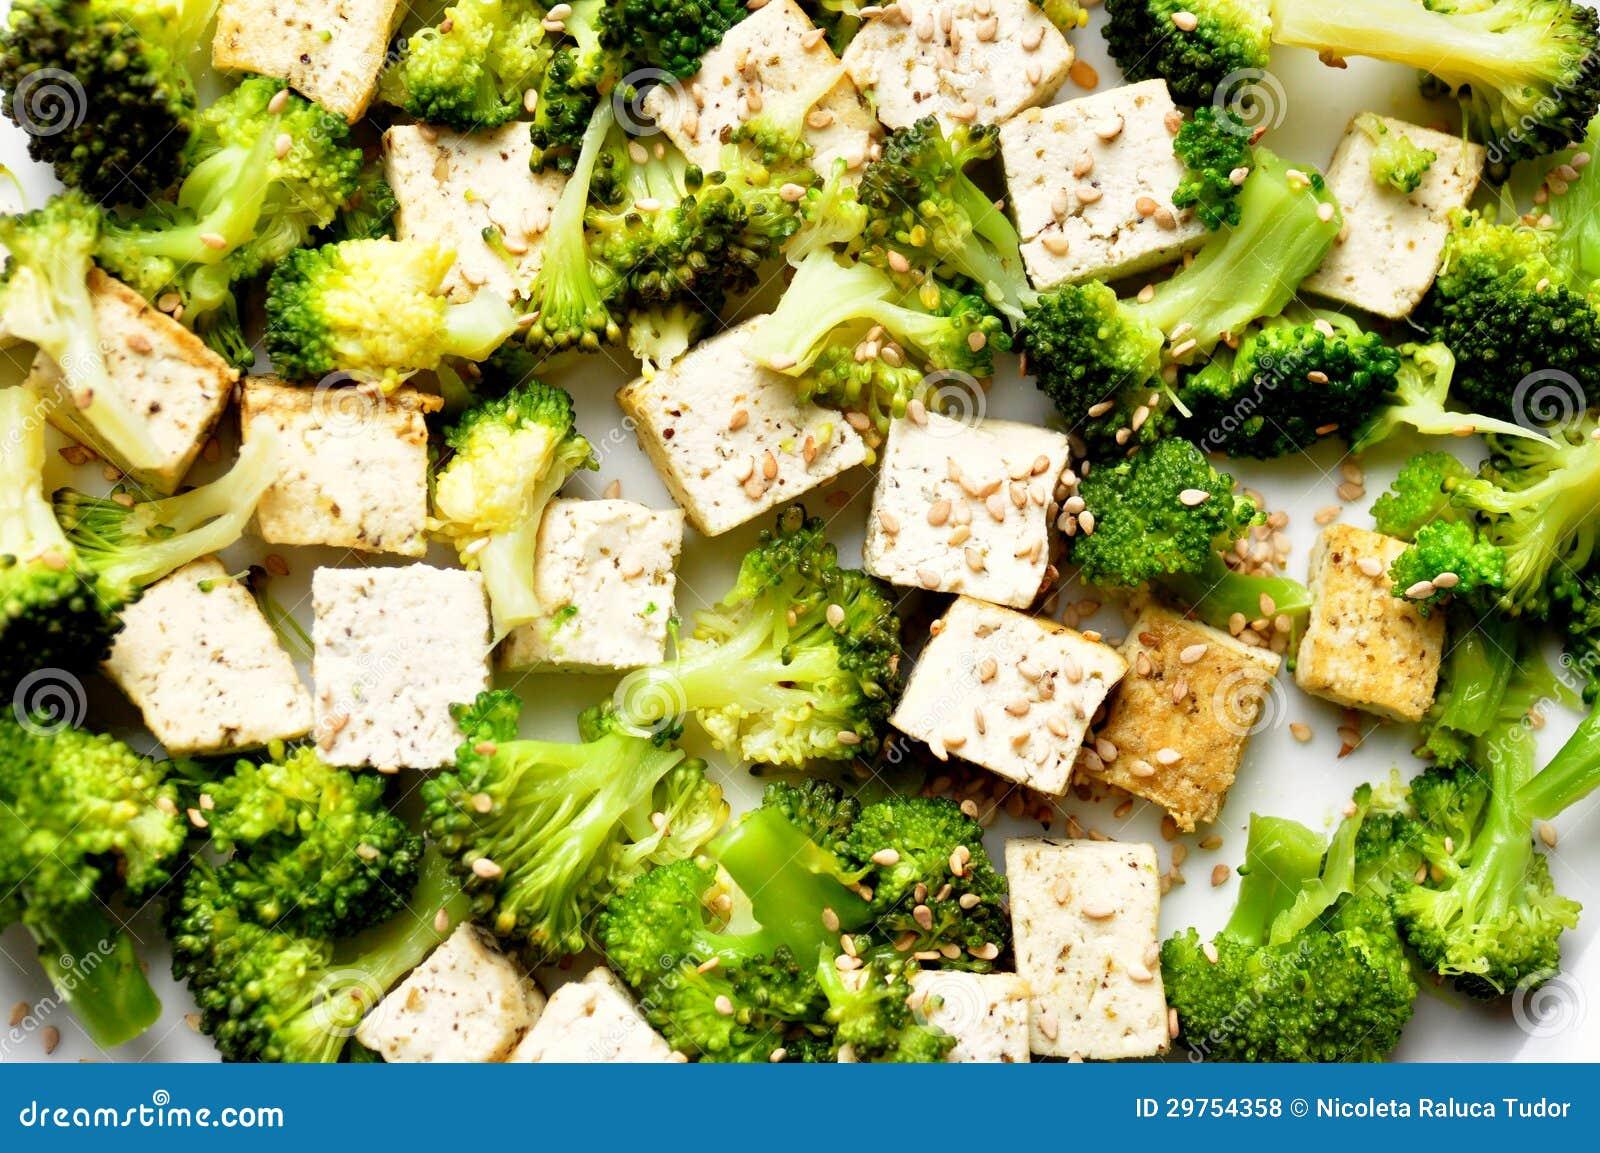 Vegan Food Steamed Broccoli And Tofu Dish Stock Photo